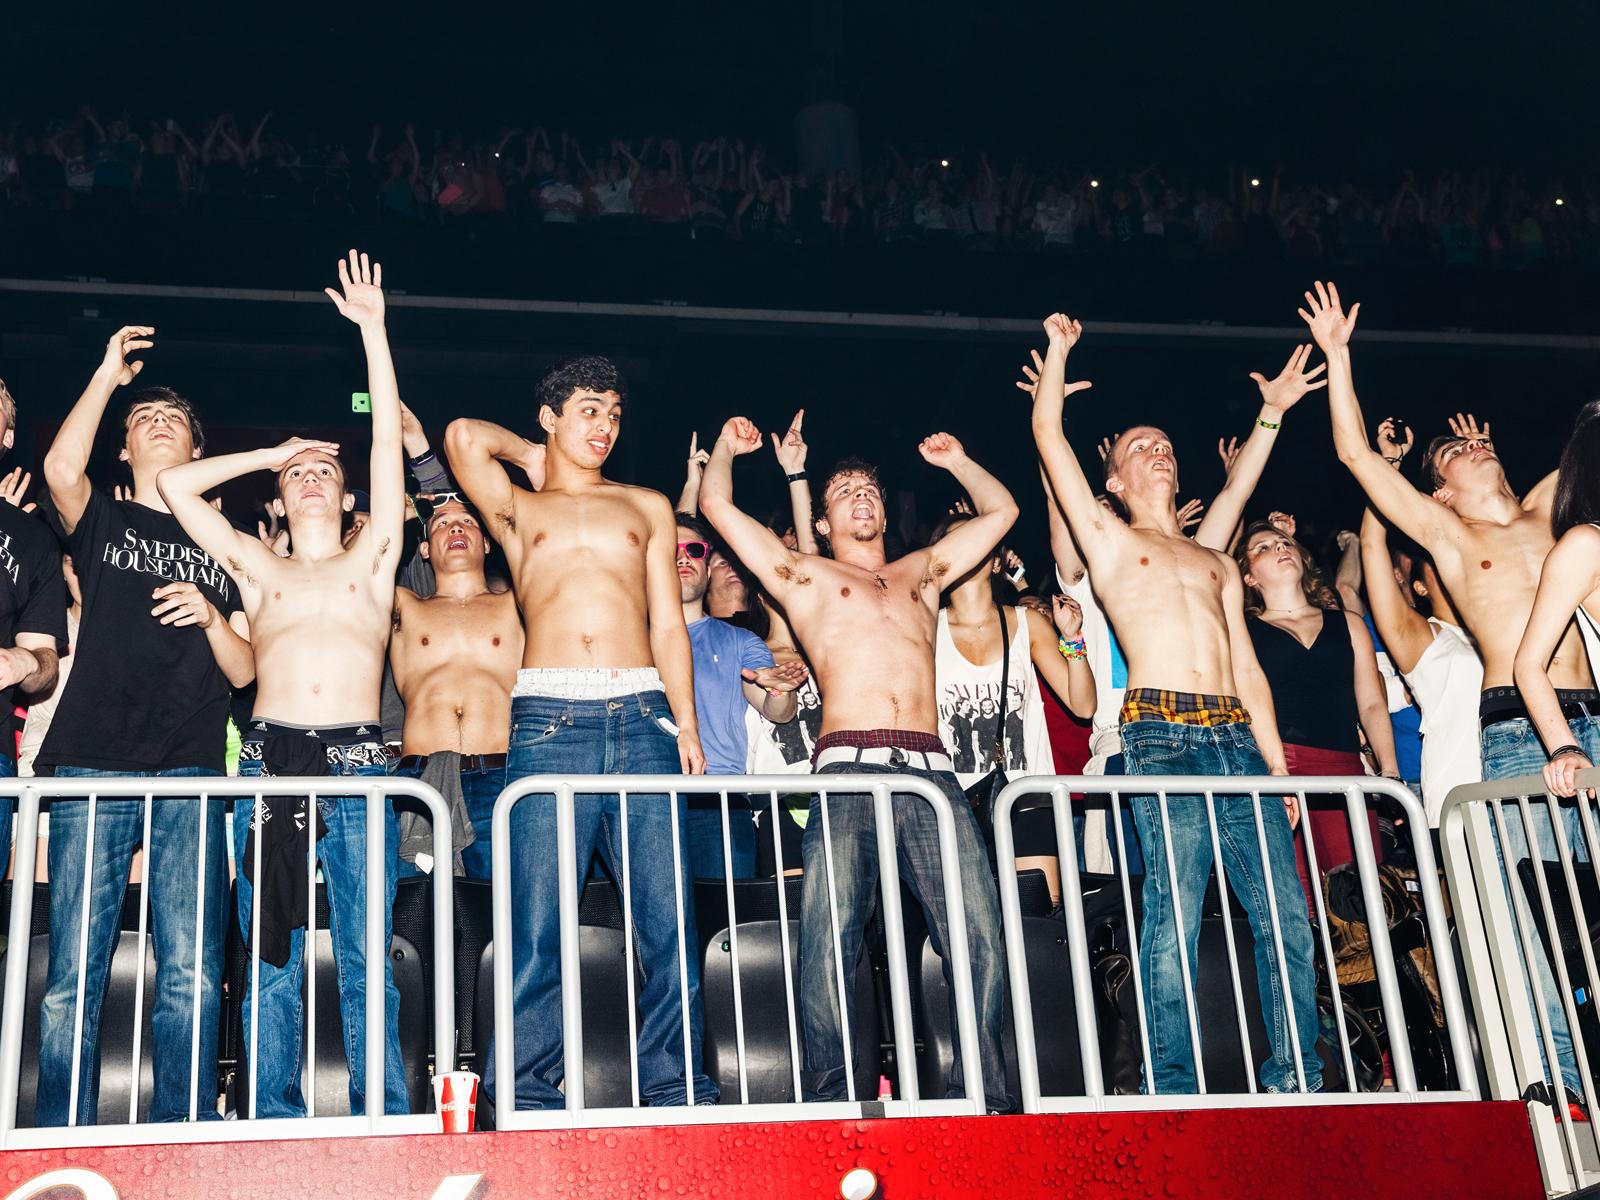 Swedish House Mafia fans